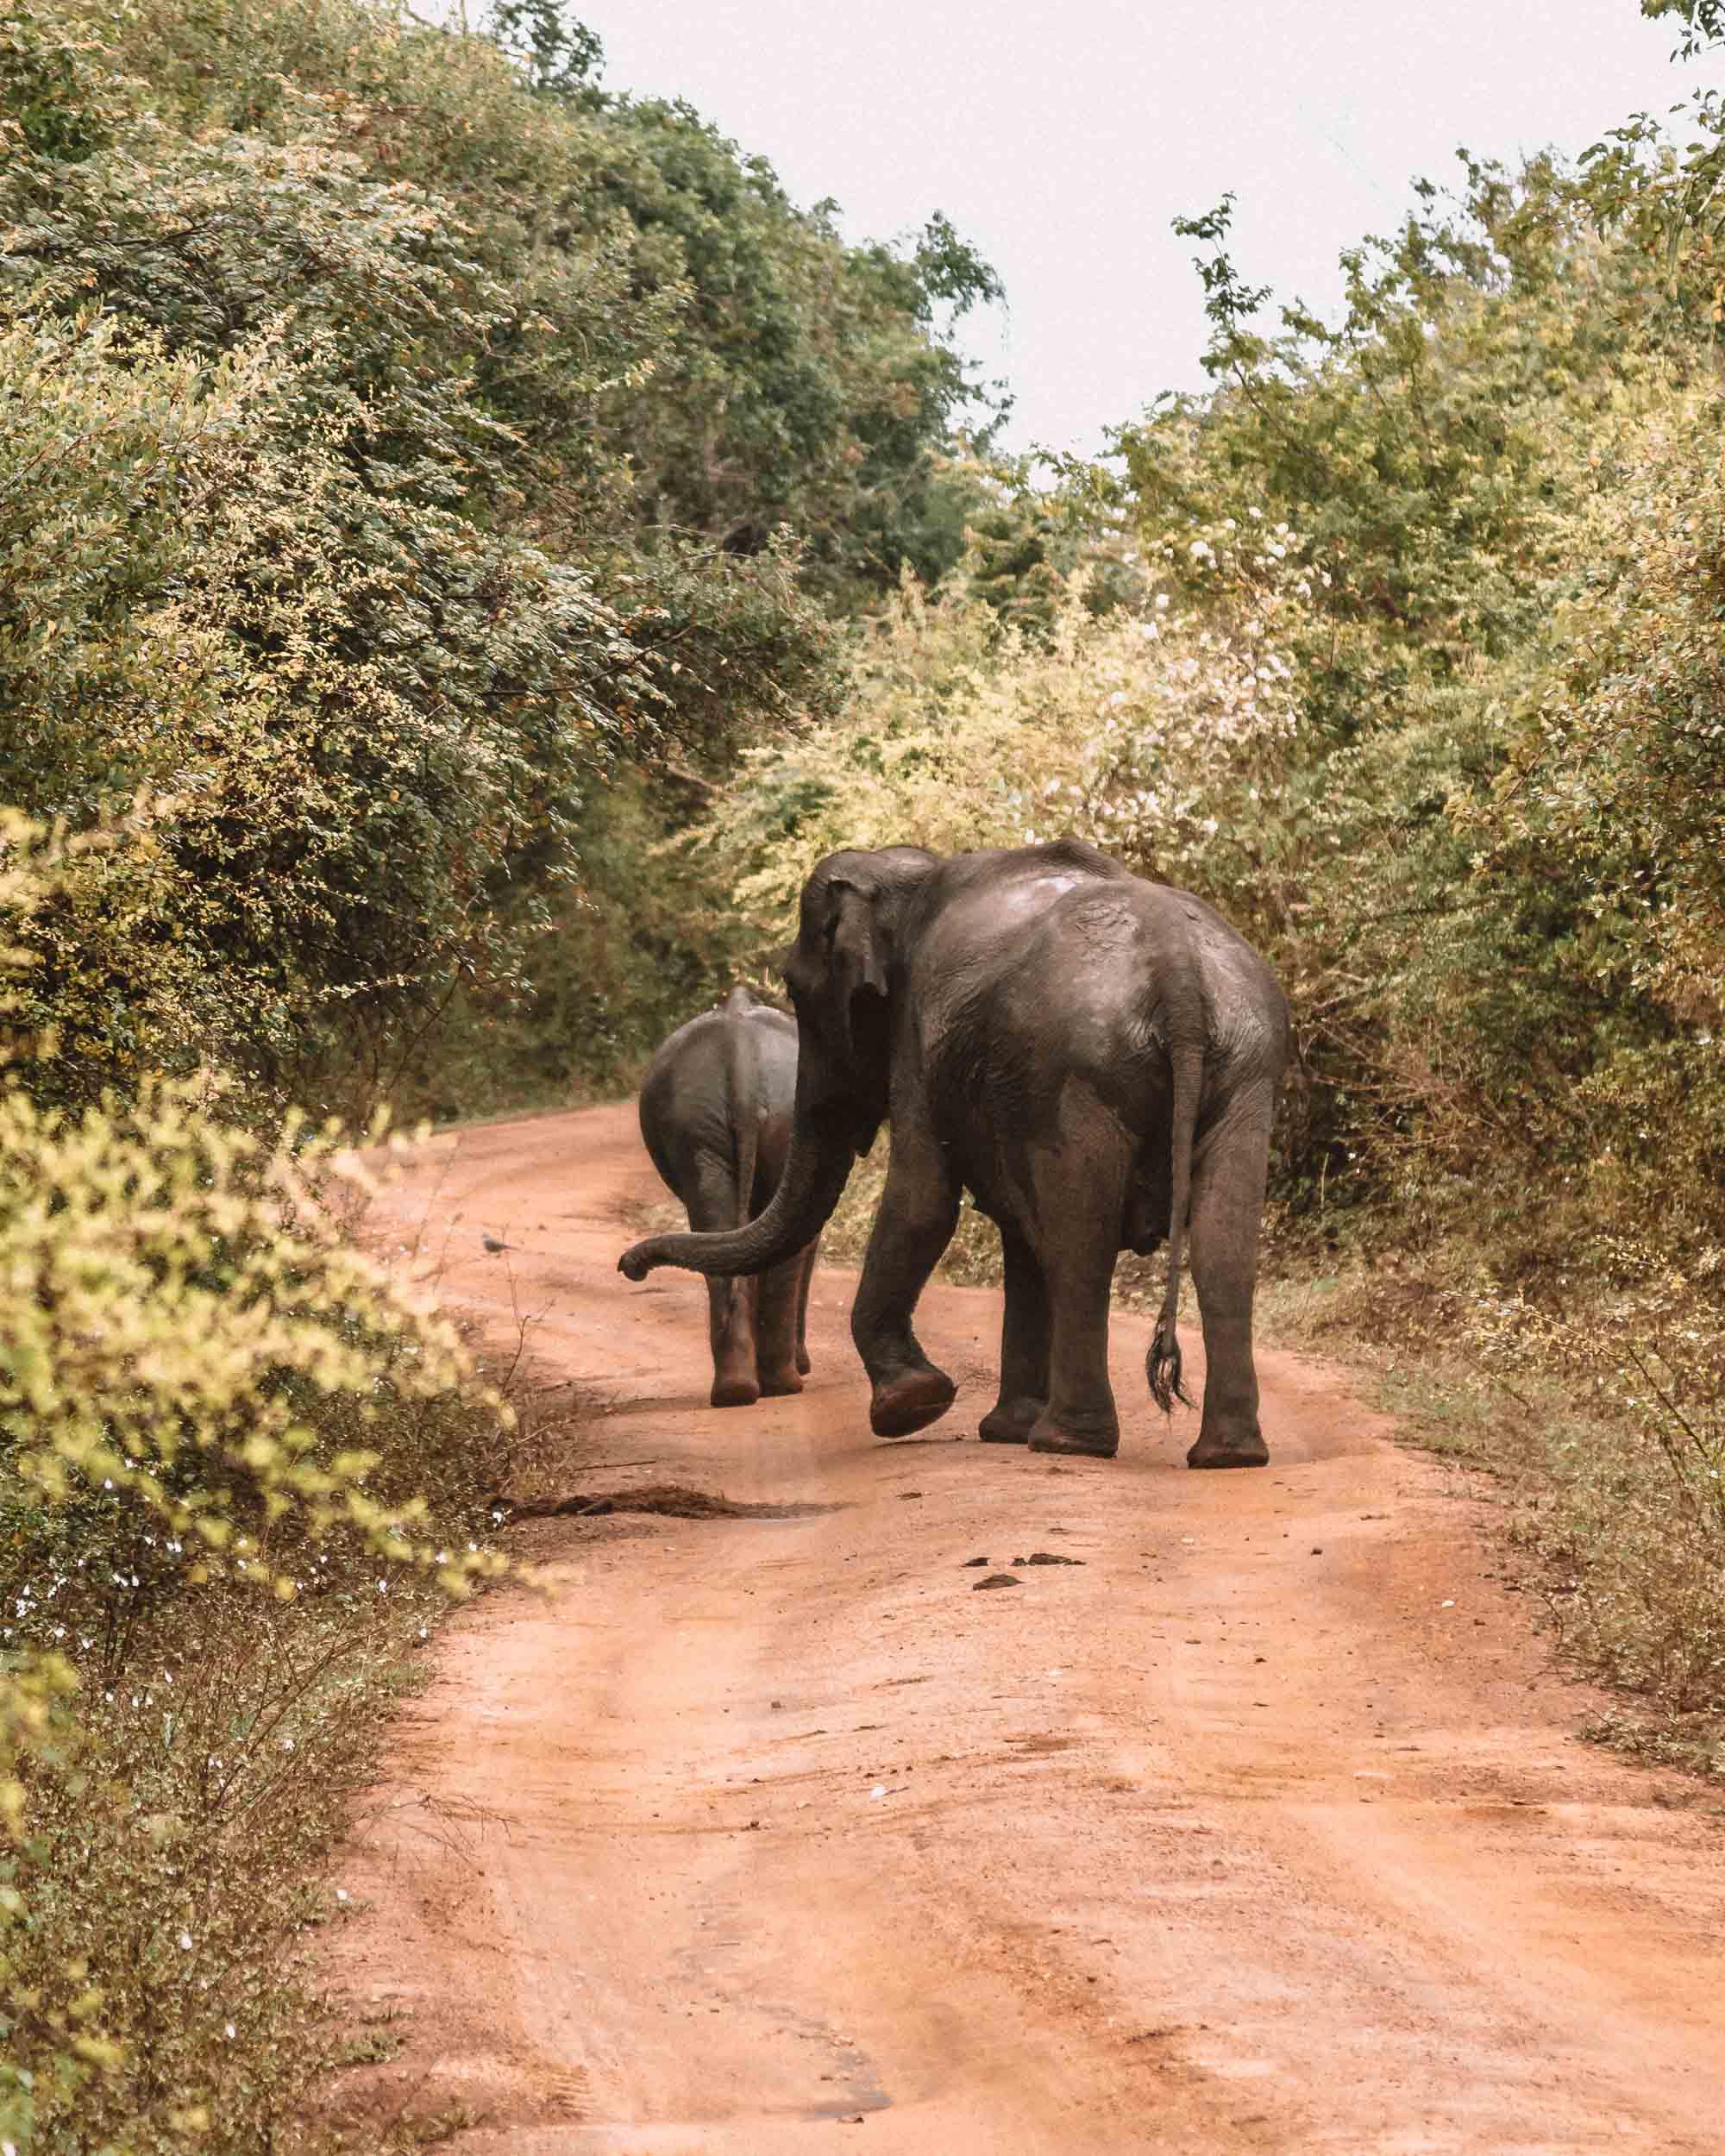 Yala national park Chena Huts uga escapes safari ride wildlife mom and baby elephant